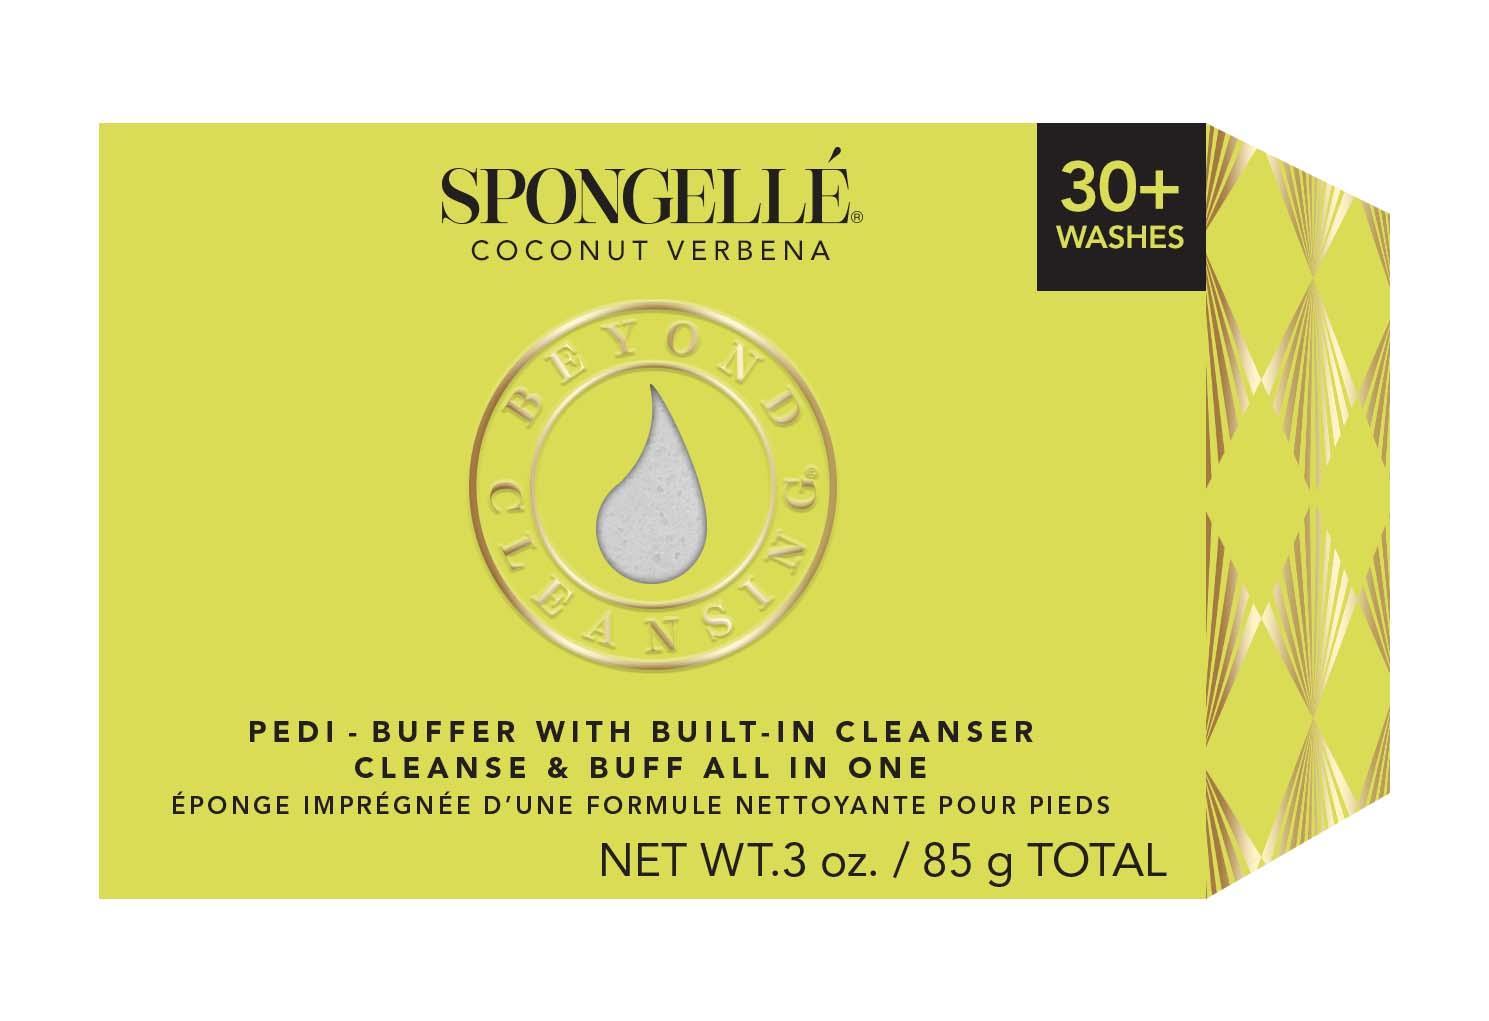 Spongelle Pedi Buffer - Coconut Verbena 30+ Washes, 85g